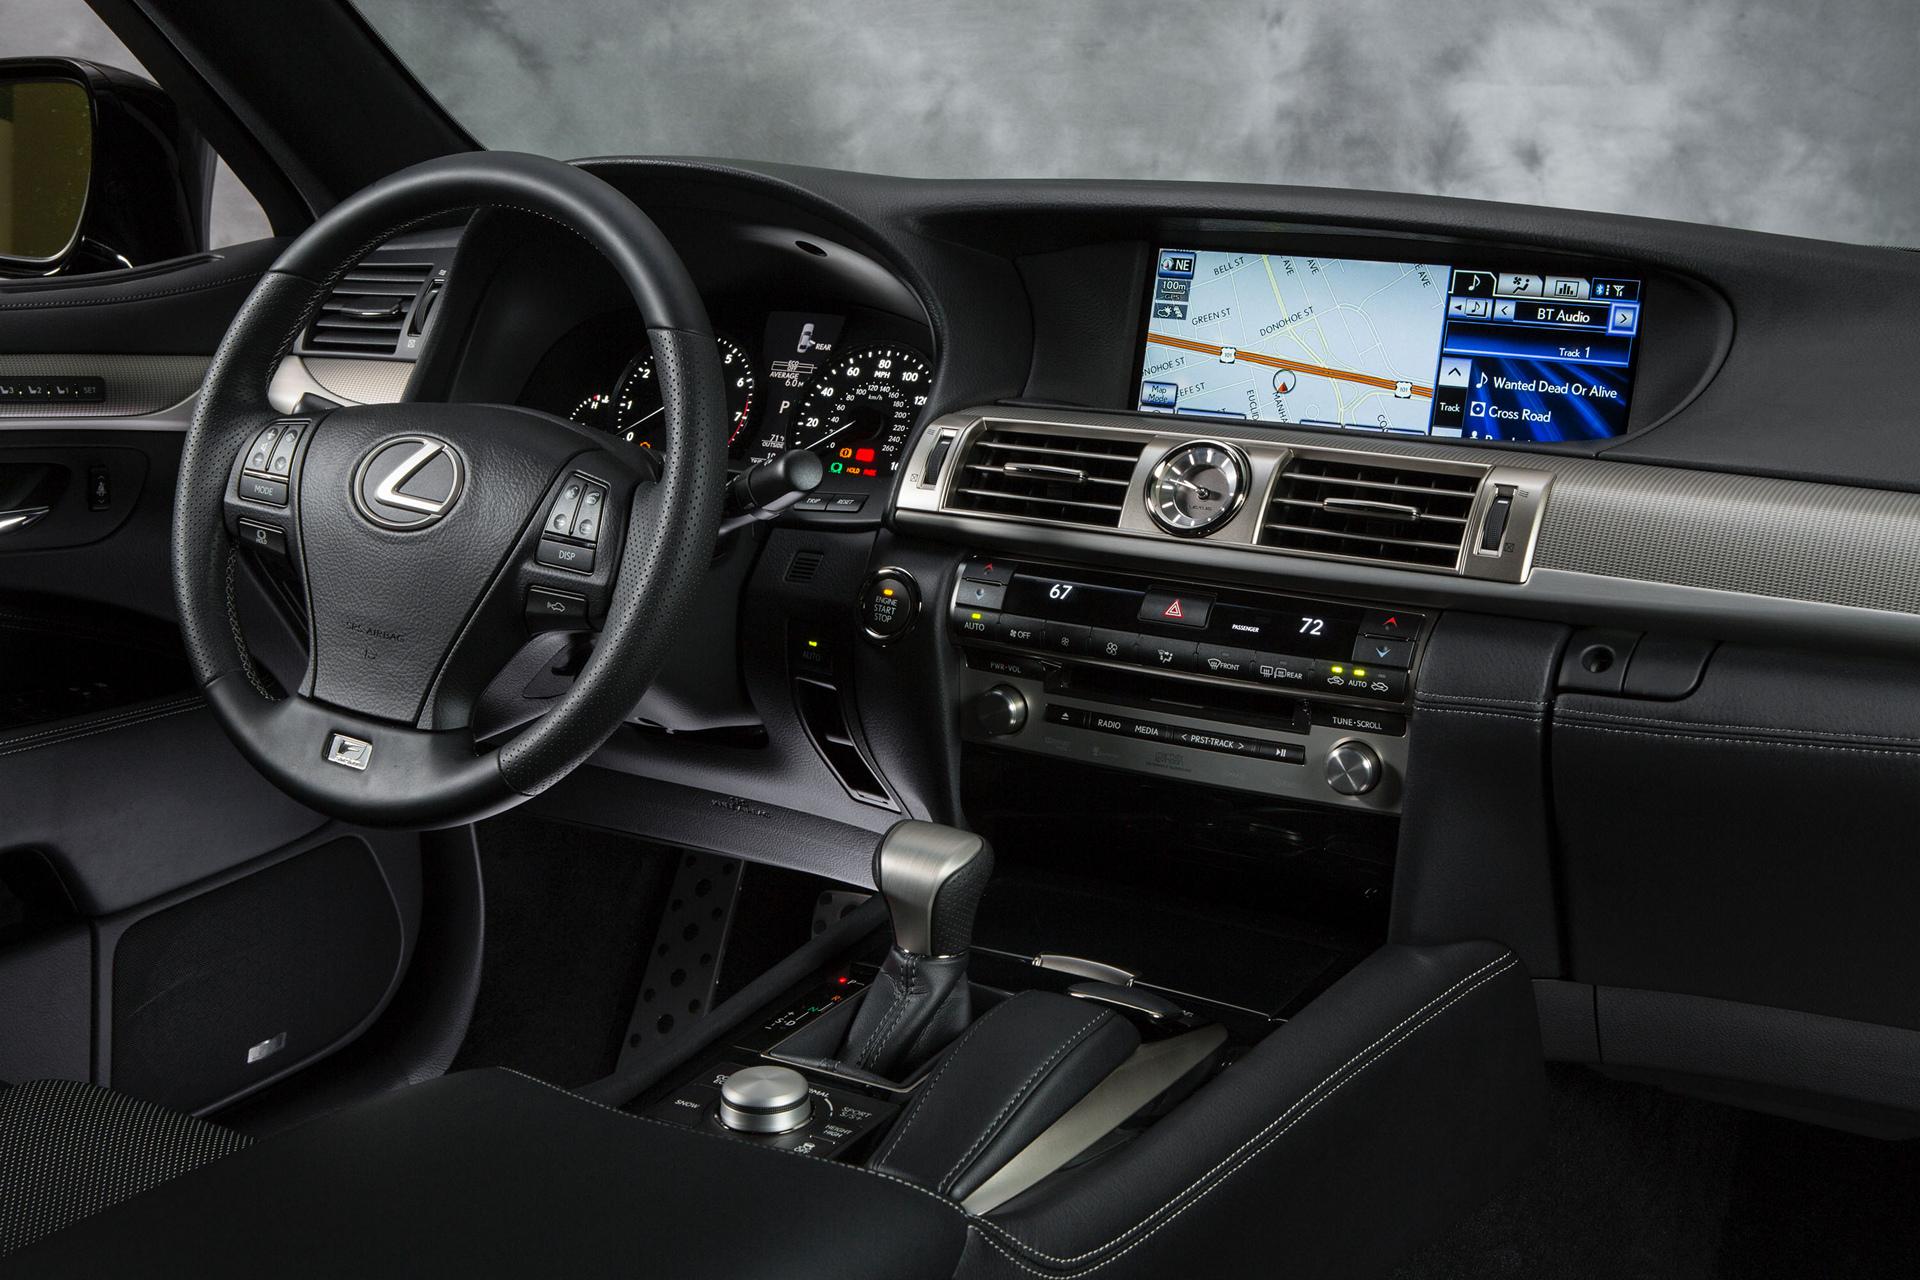 2016 Lexus Ls 460 F Sport Toyota Motor Corporation Carrrs Auto Portal